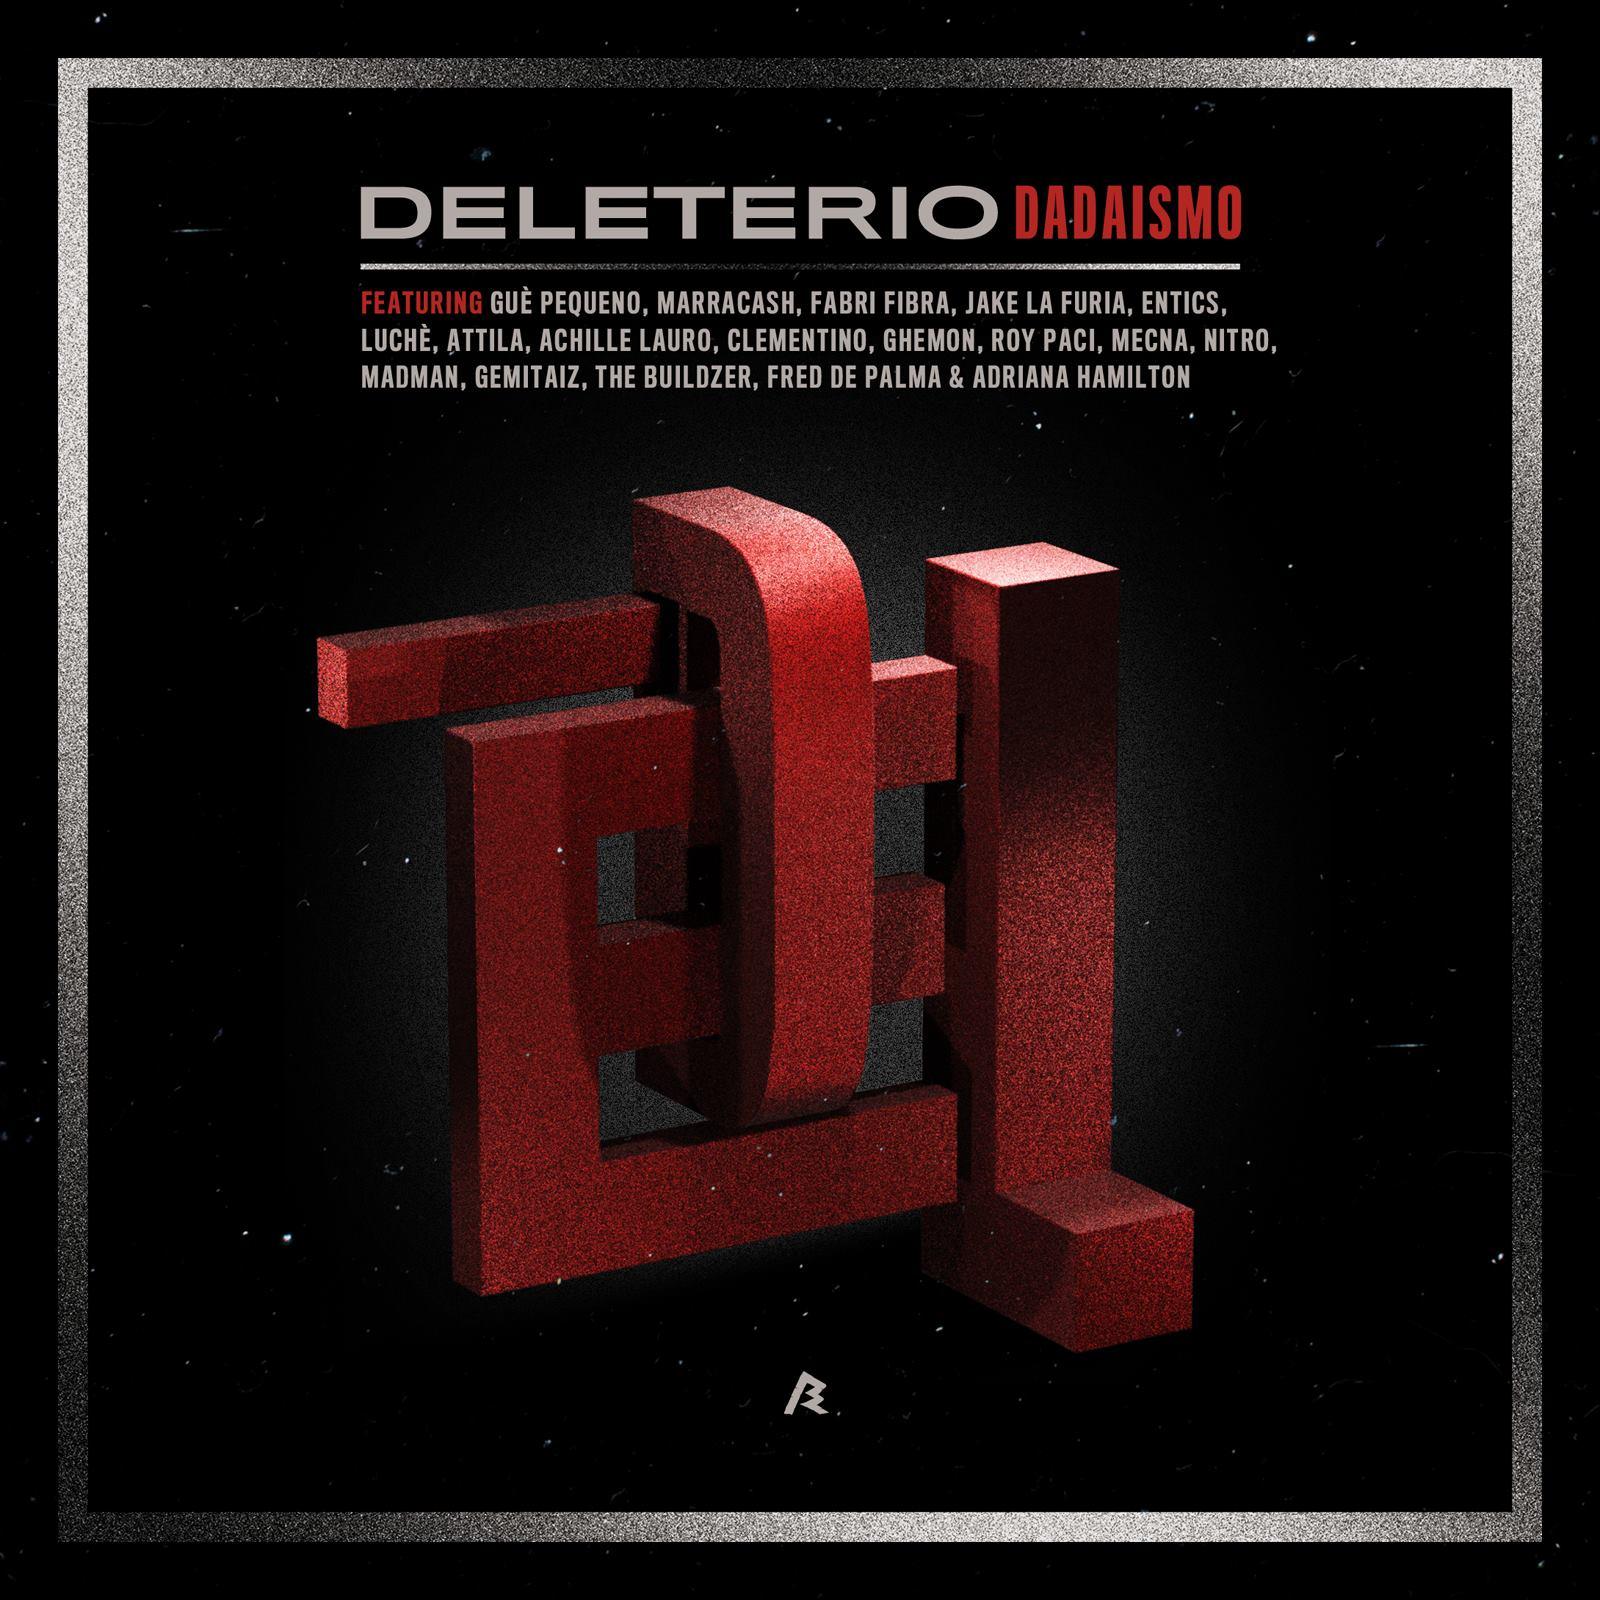 Deleterio Dadaismo download album